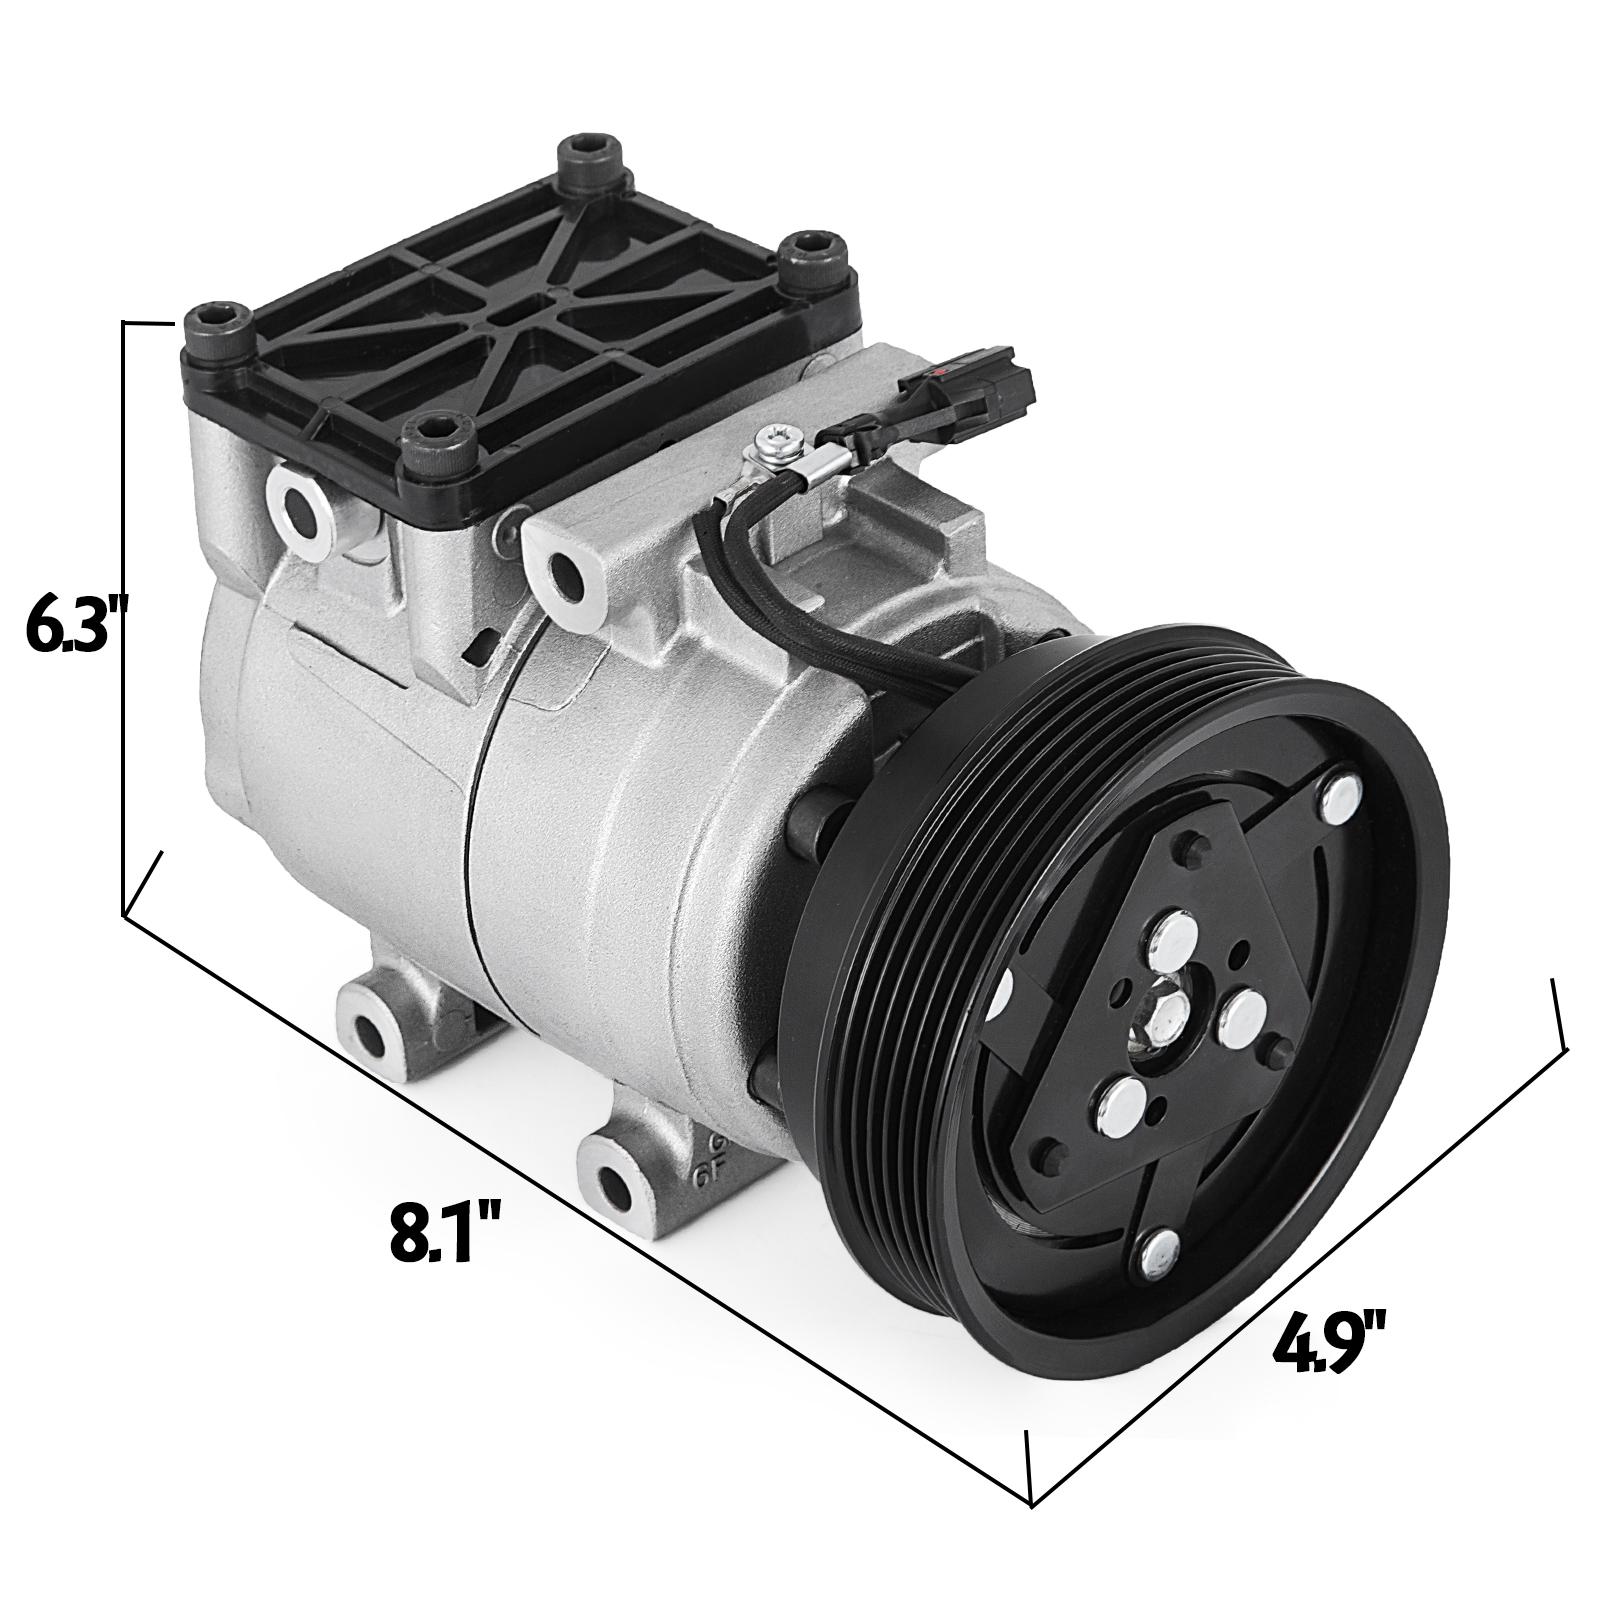 AC A//C Compressor for Hyundai Tiburon 2003-2006 2007 2008 2.7L 58199 CO 10922C